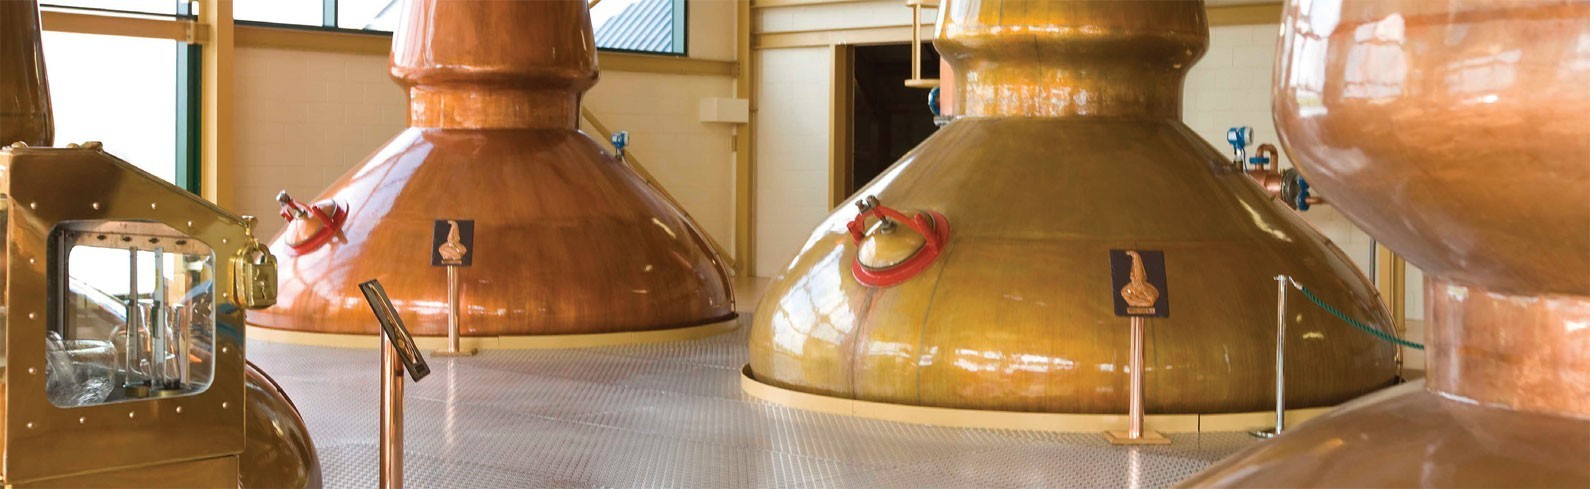 Chivas Brothers The Glenlivet Distillery